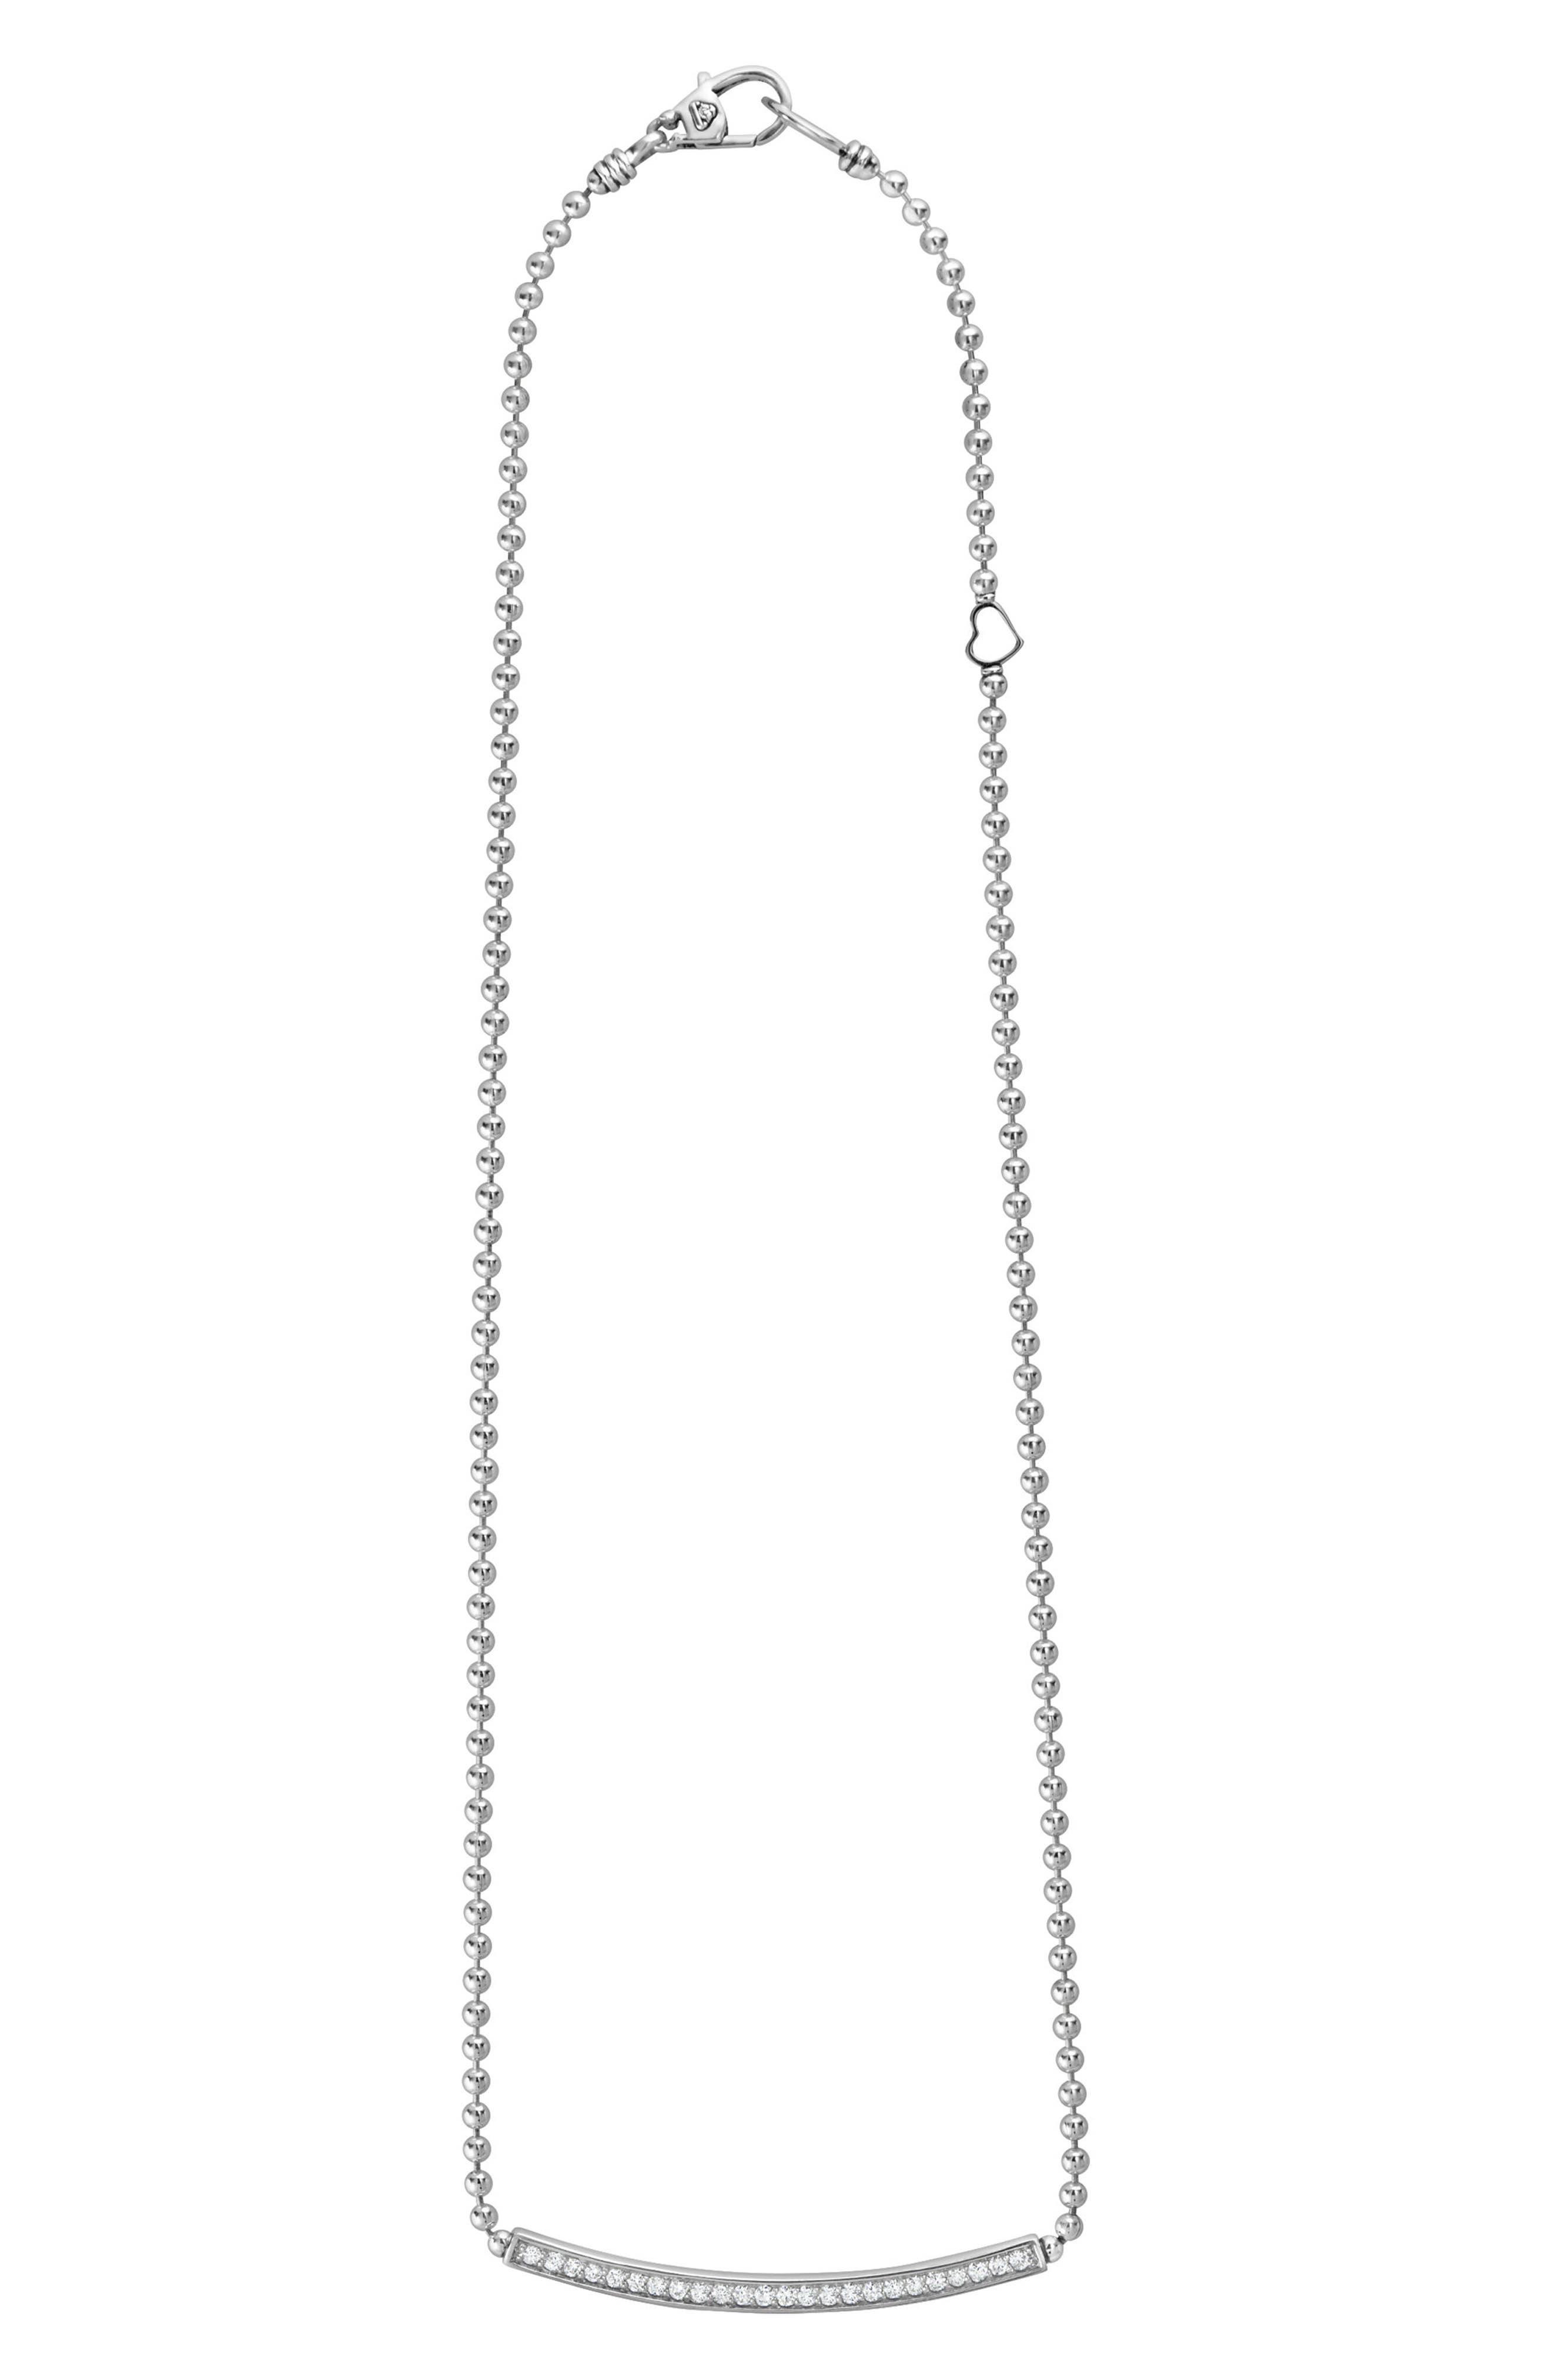 Caviar Spark Diamond Bar Necklace,                             Main thumbnail 1, color,                             SILVER/ DIAMOND